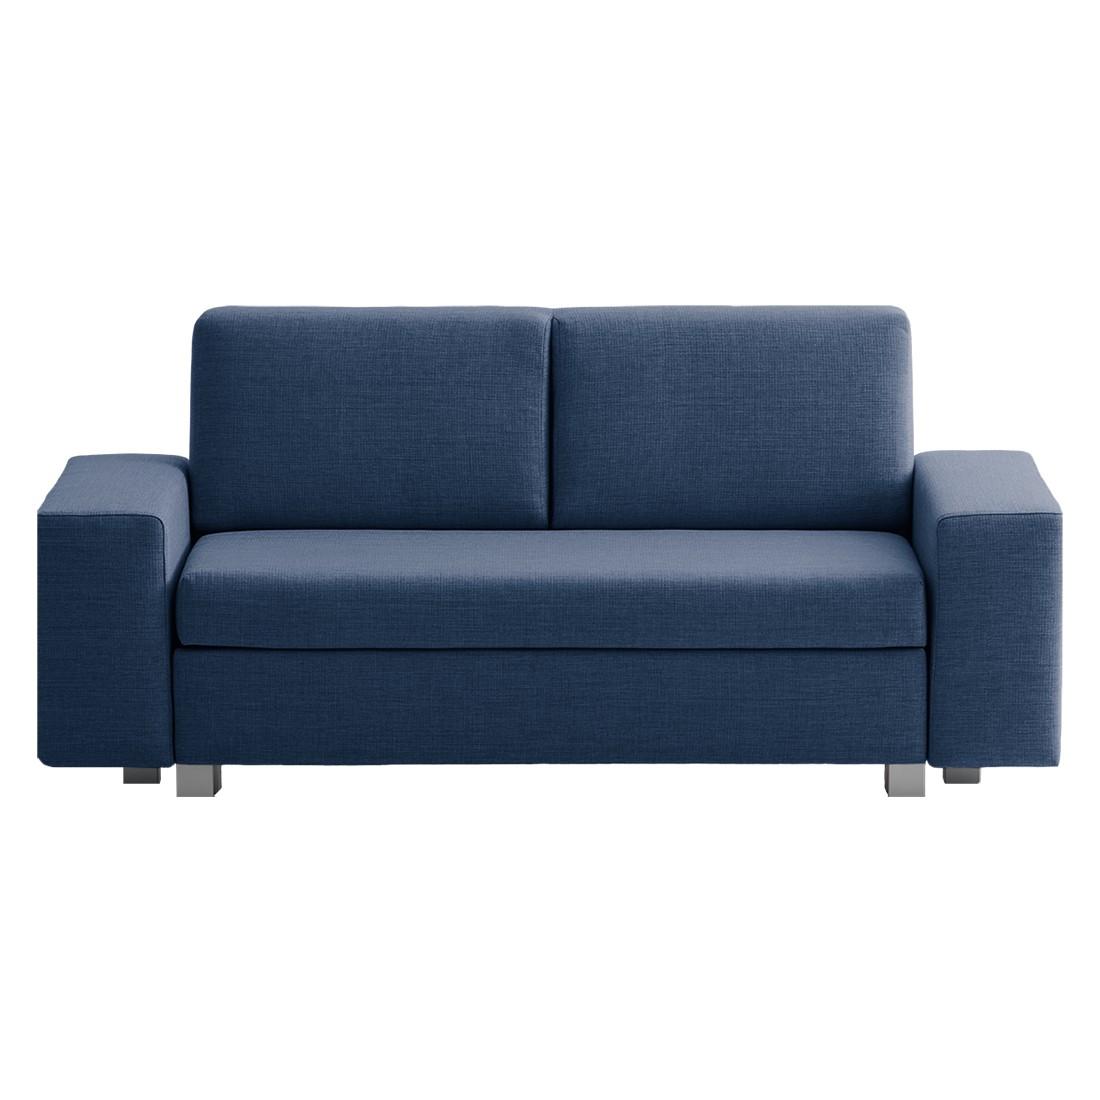 schlafsofa plaza webstoff blau 198 cm ma e breite 198 cm h he 78 cm. Black Bedroom Furniture Sets. Home Design Ideas